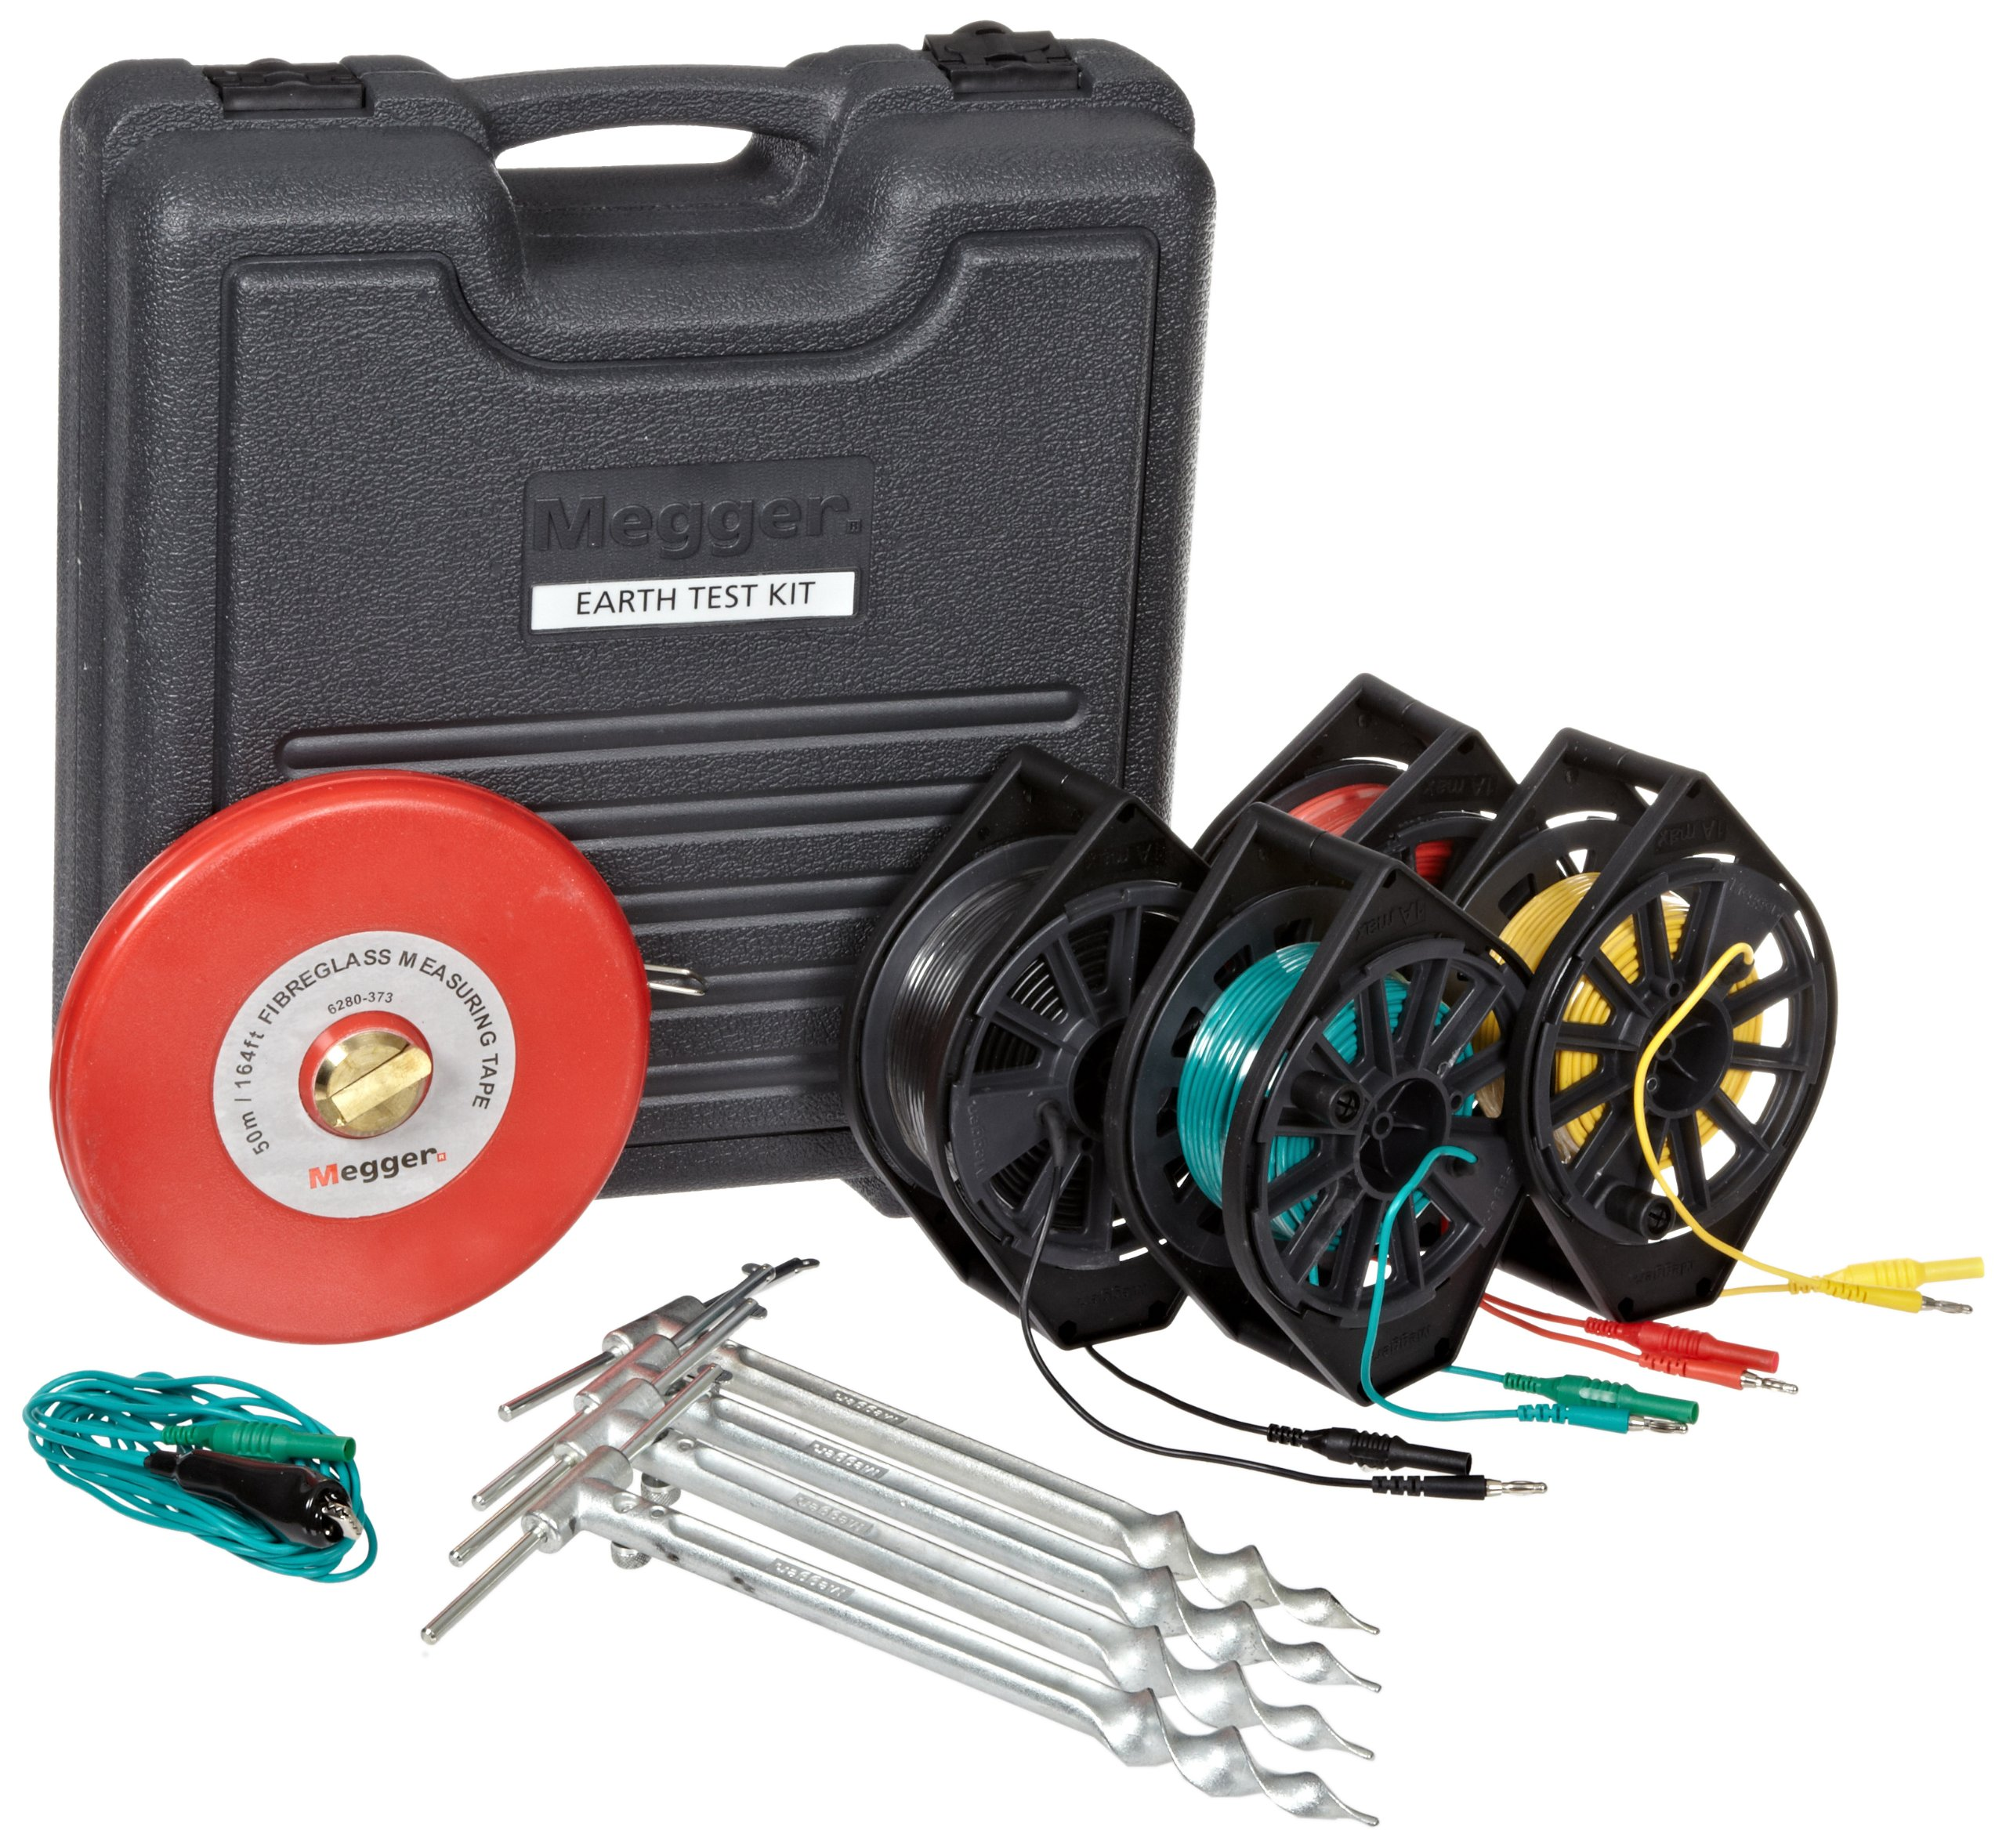 Megger 6320-245 Professional Ground Test Kit for DET3 & DET4 Series Ground Resistance Testers